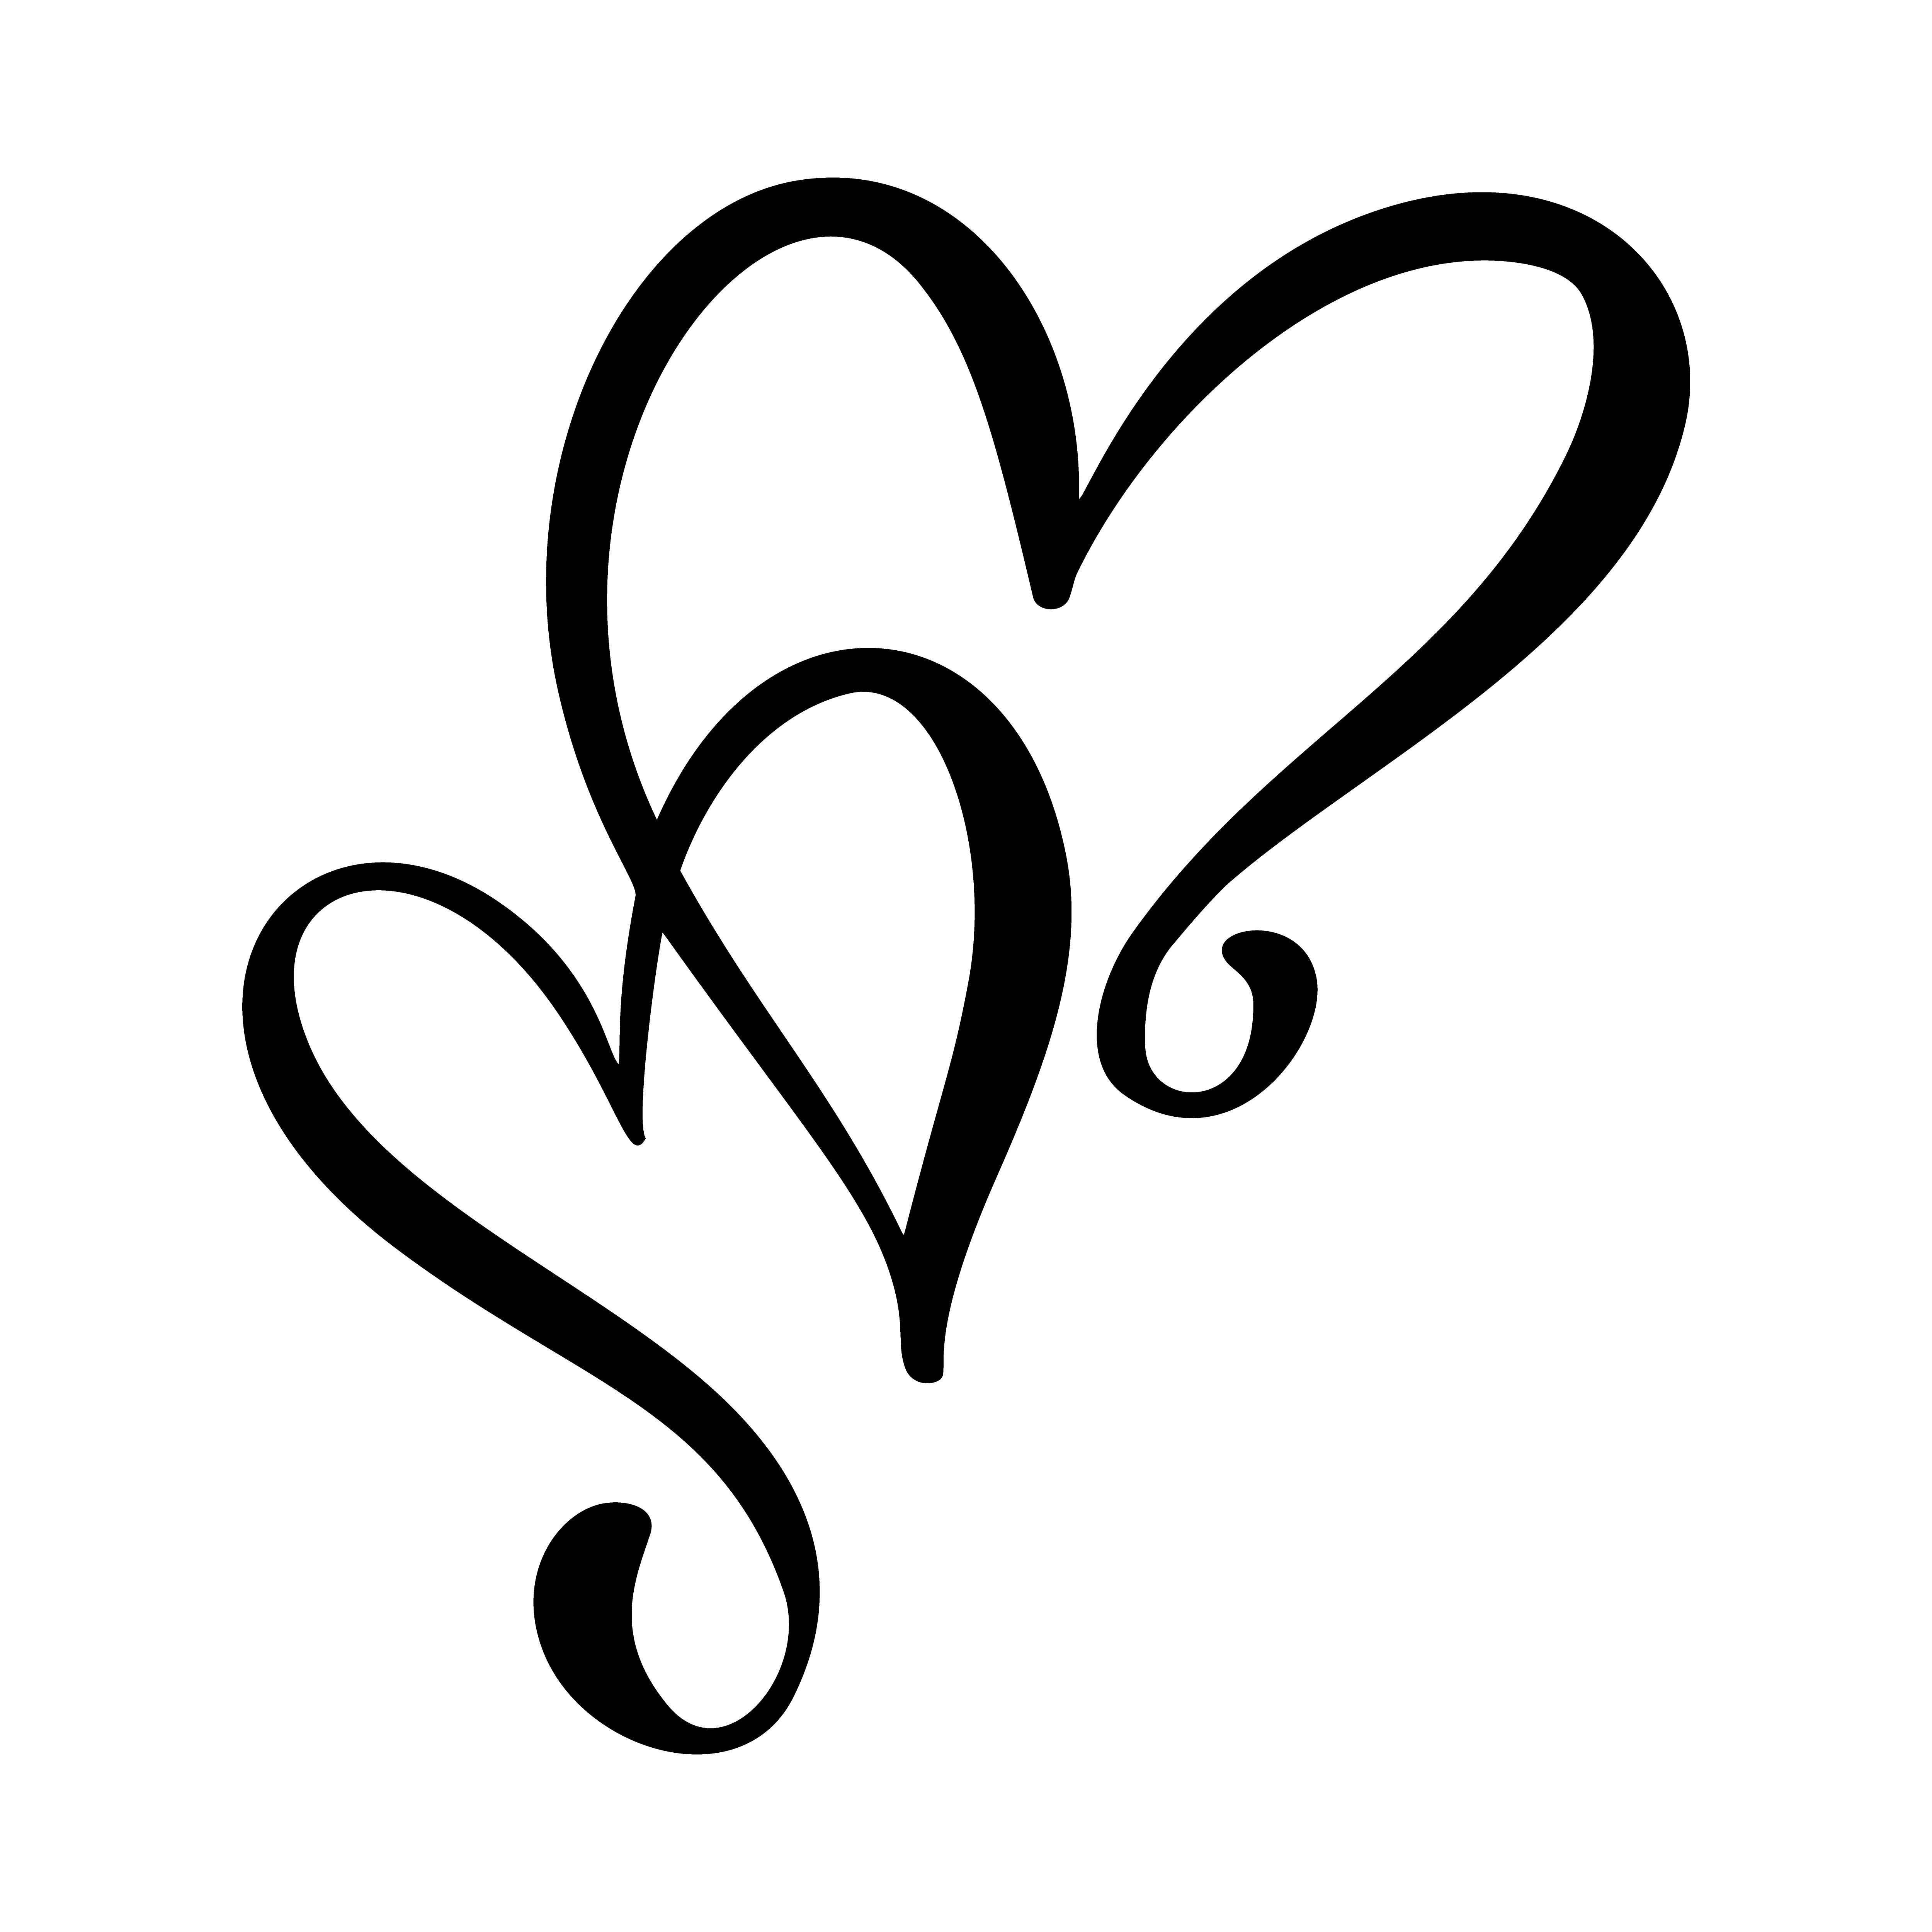 Calligraphic love hearts design download free vectors for Love design